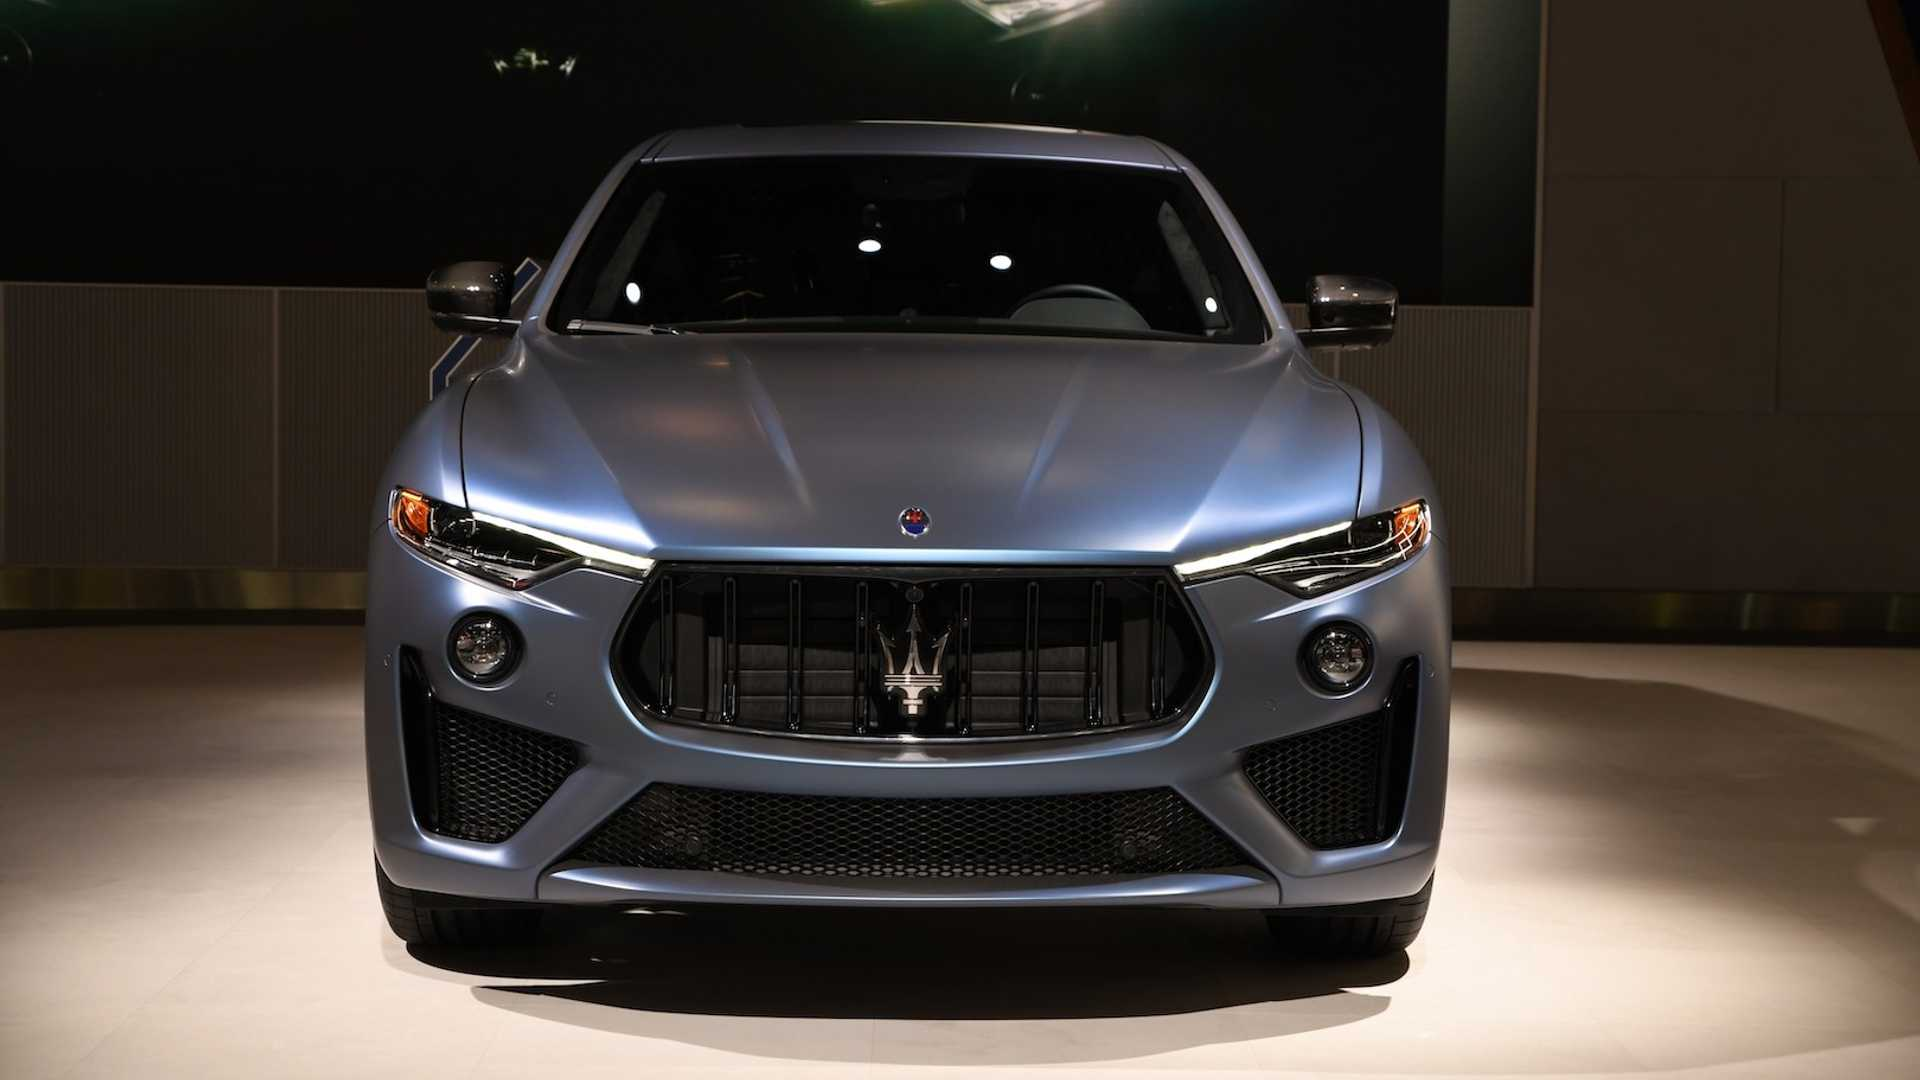 Звезда NBA Рэй Аллен купил эксклюзивный Maserati Levante 1